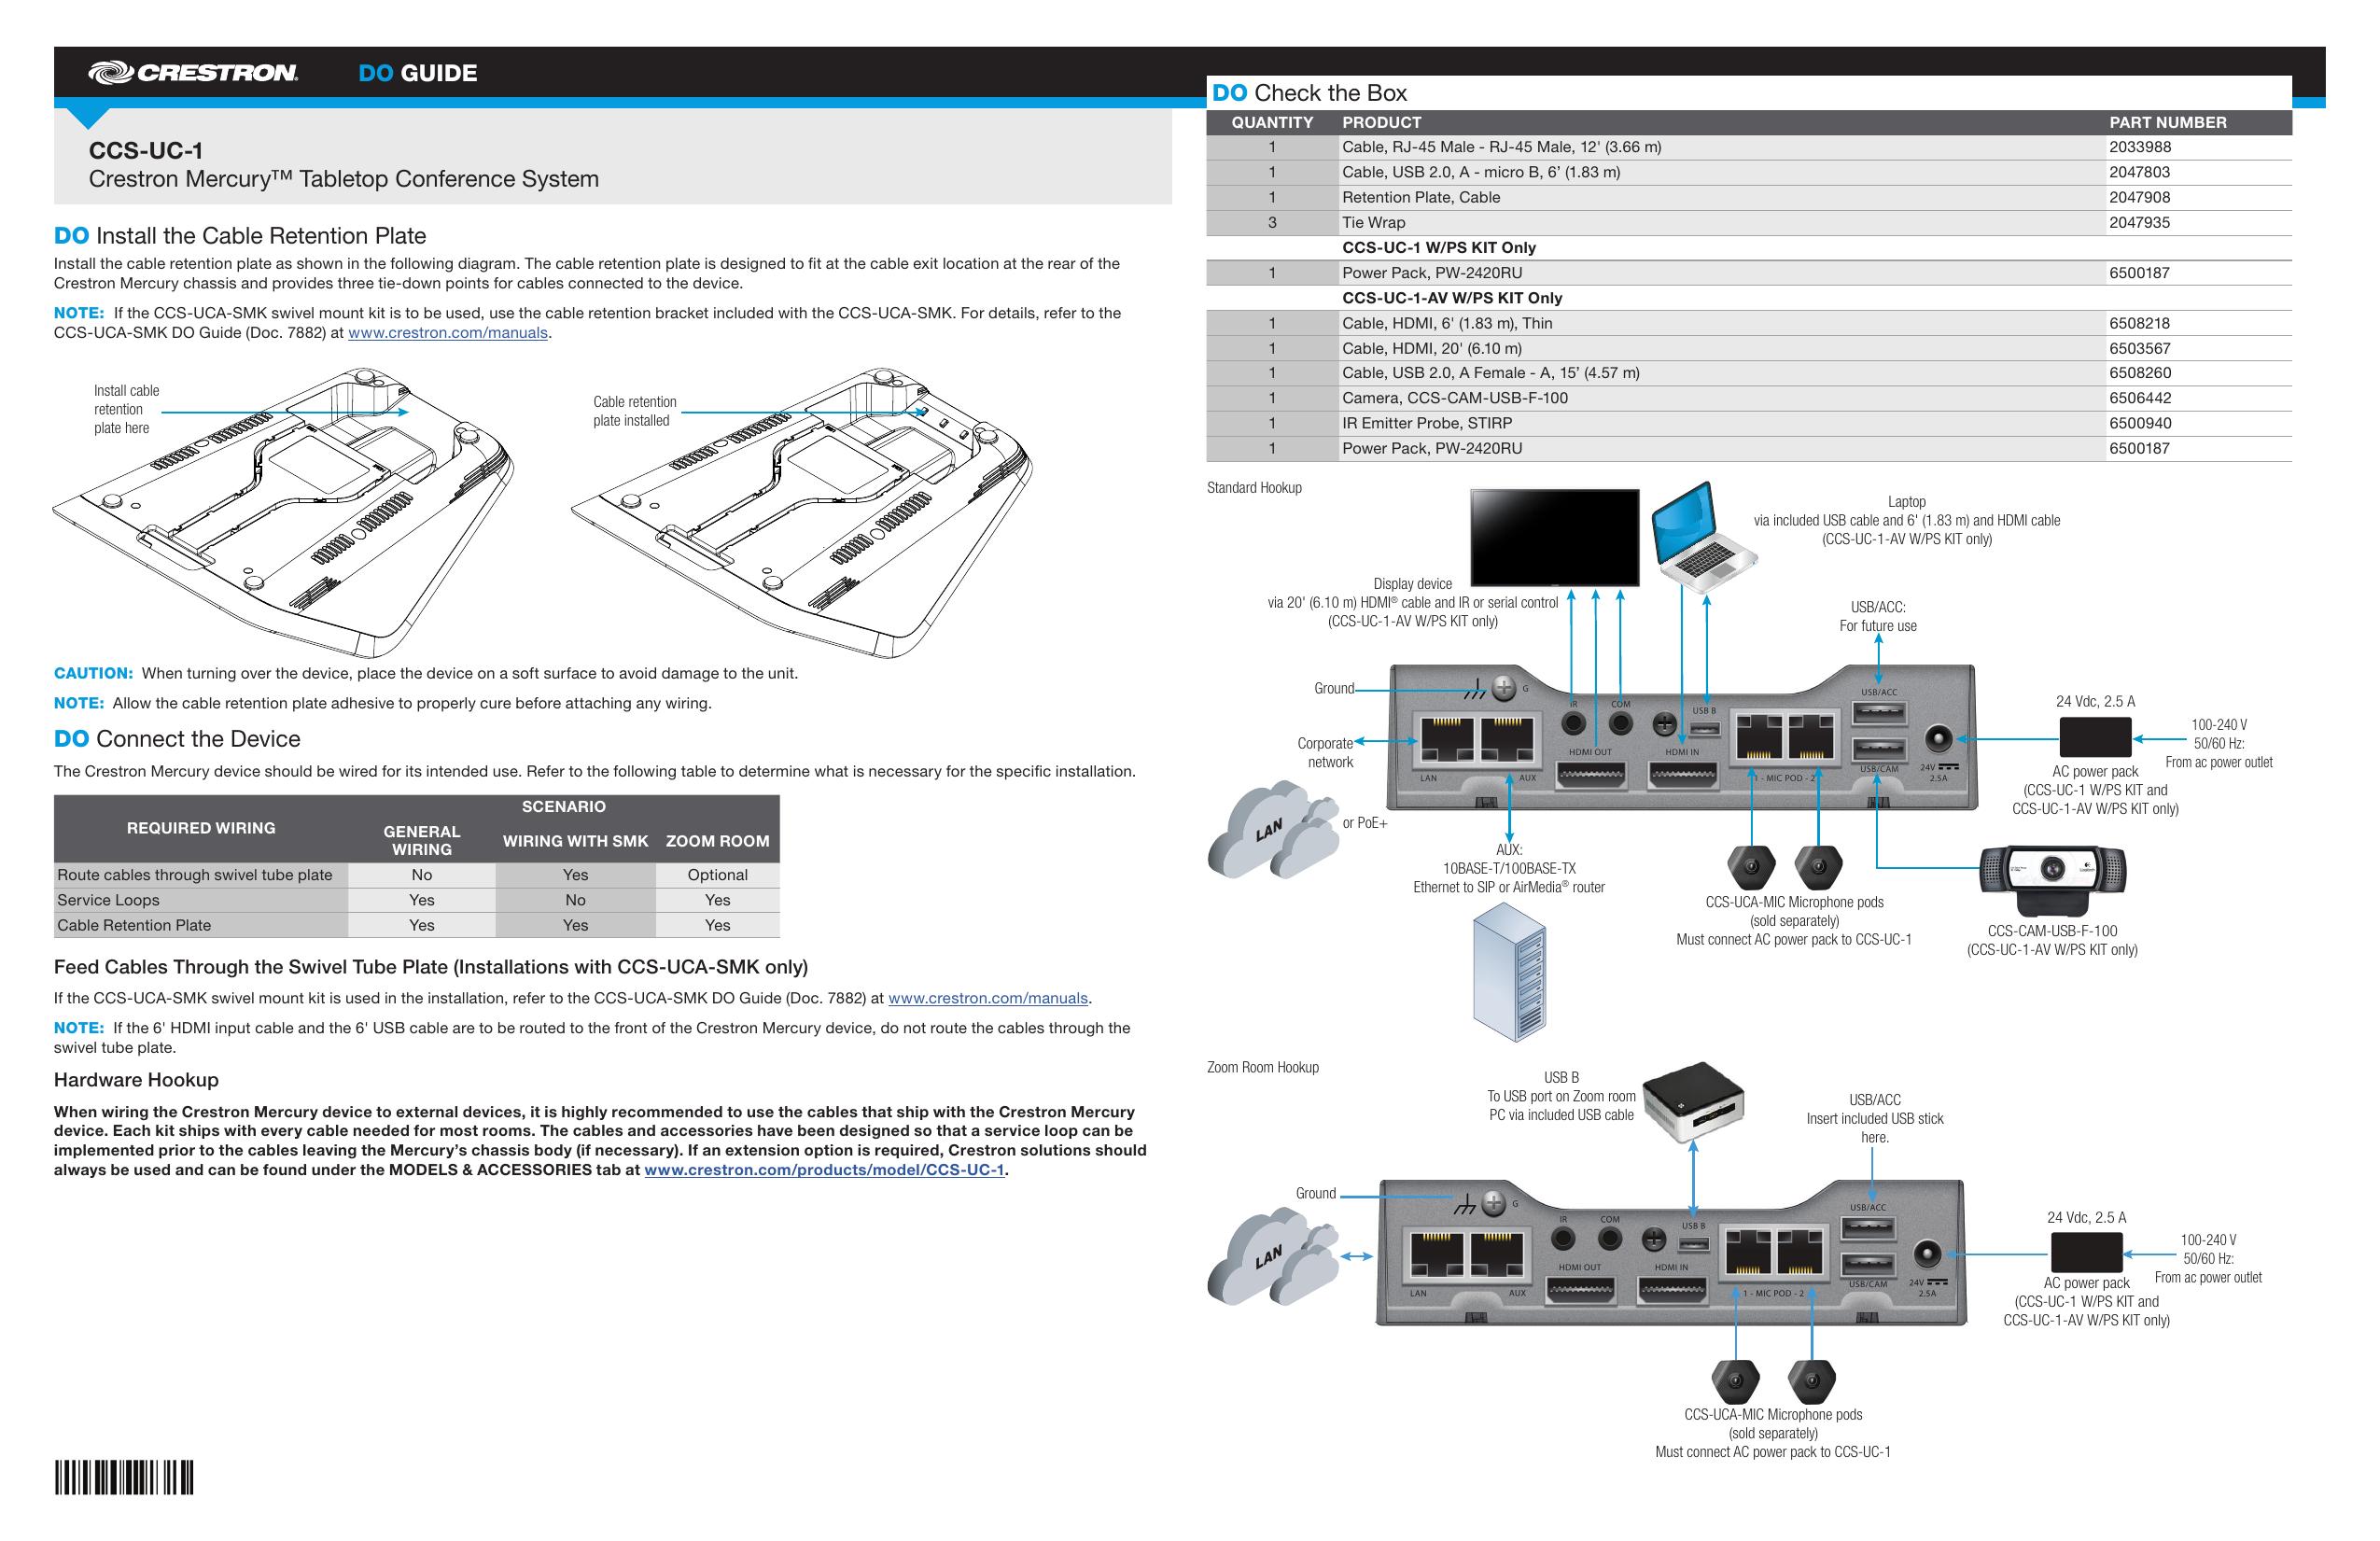 Mic Wiring Diagrams Crestron Electrical Cls C6 Diagram Ccs Uc 1 Manualzz Com Bose